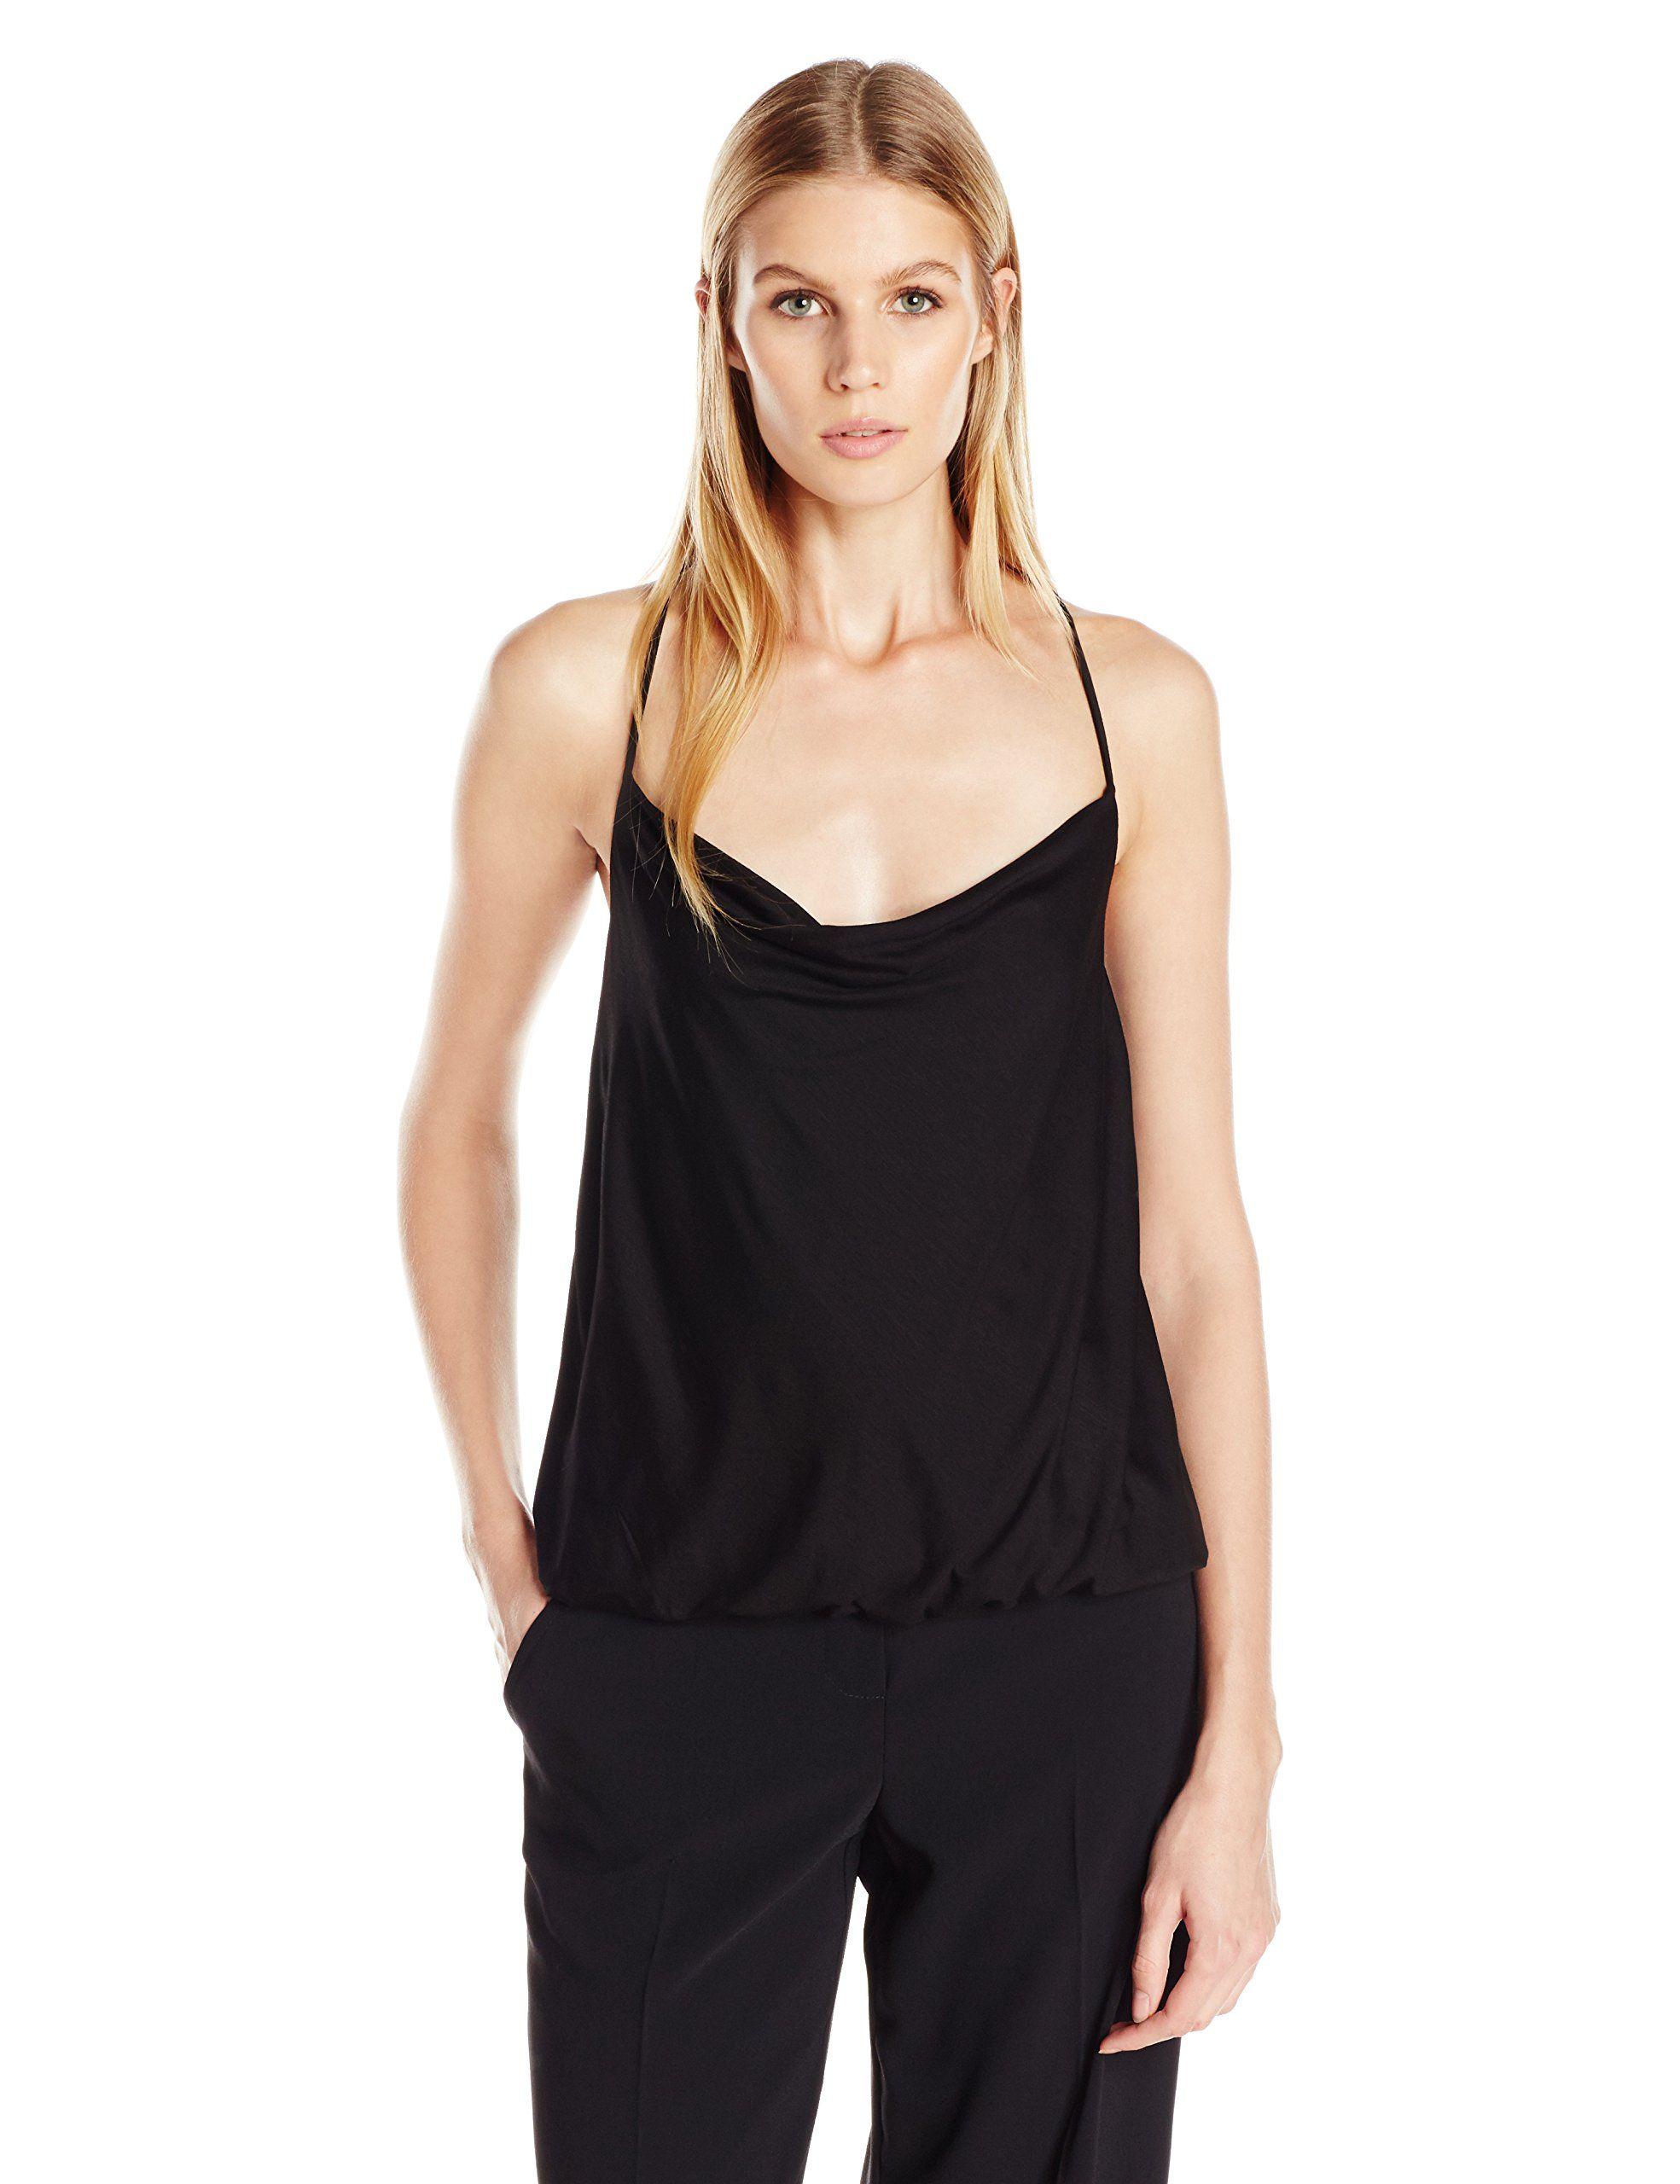 Trina Turk Women's Bela Must Have Jersey Cami, Black, X-Small. Cowl neck. Sleeveless. Elastic hem. Criss cross straps.